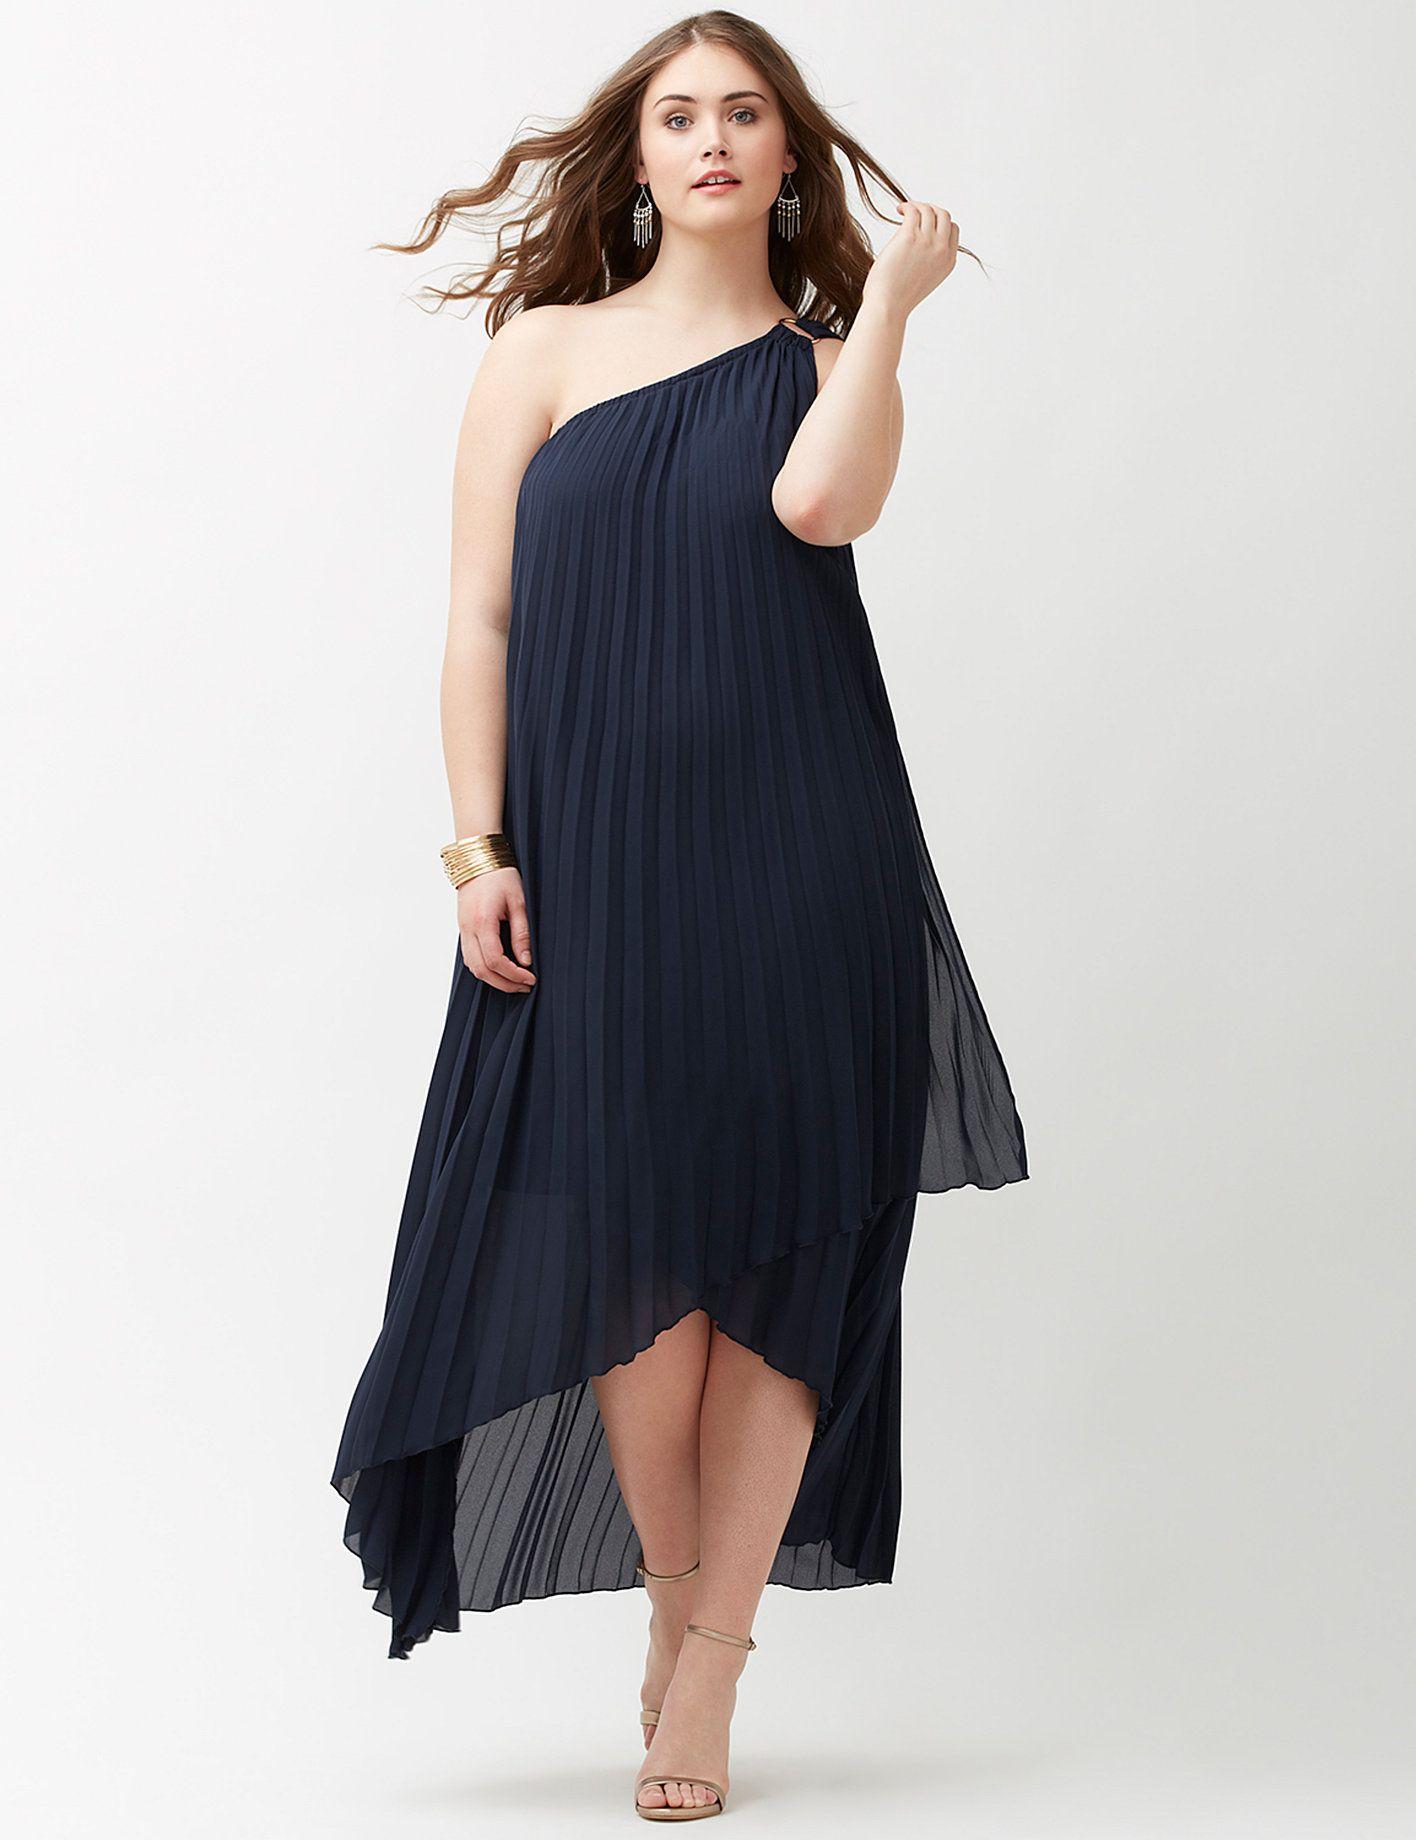 Plus Size Dresses & Skirts for Women Size 14-28 | Lane Bryant